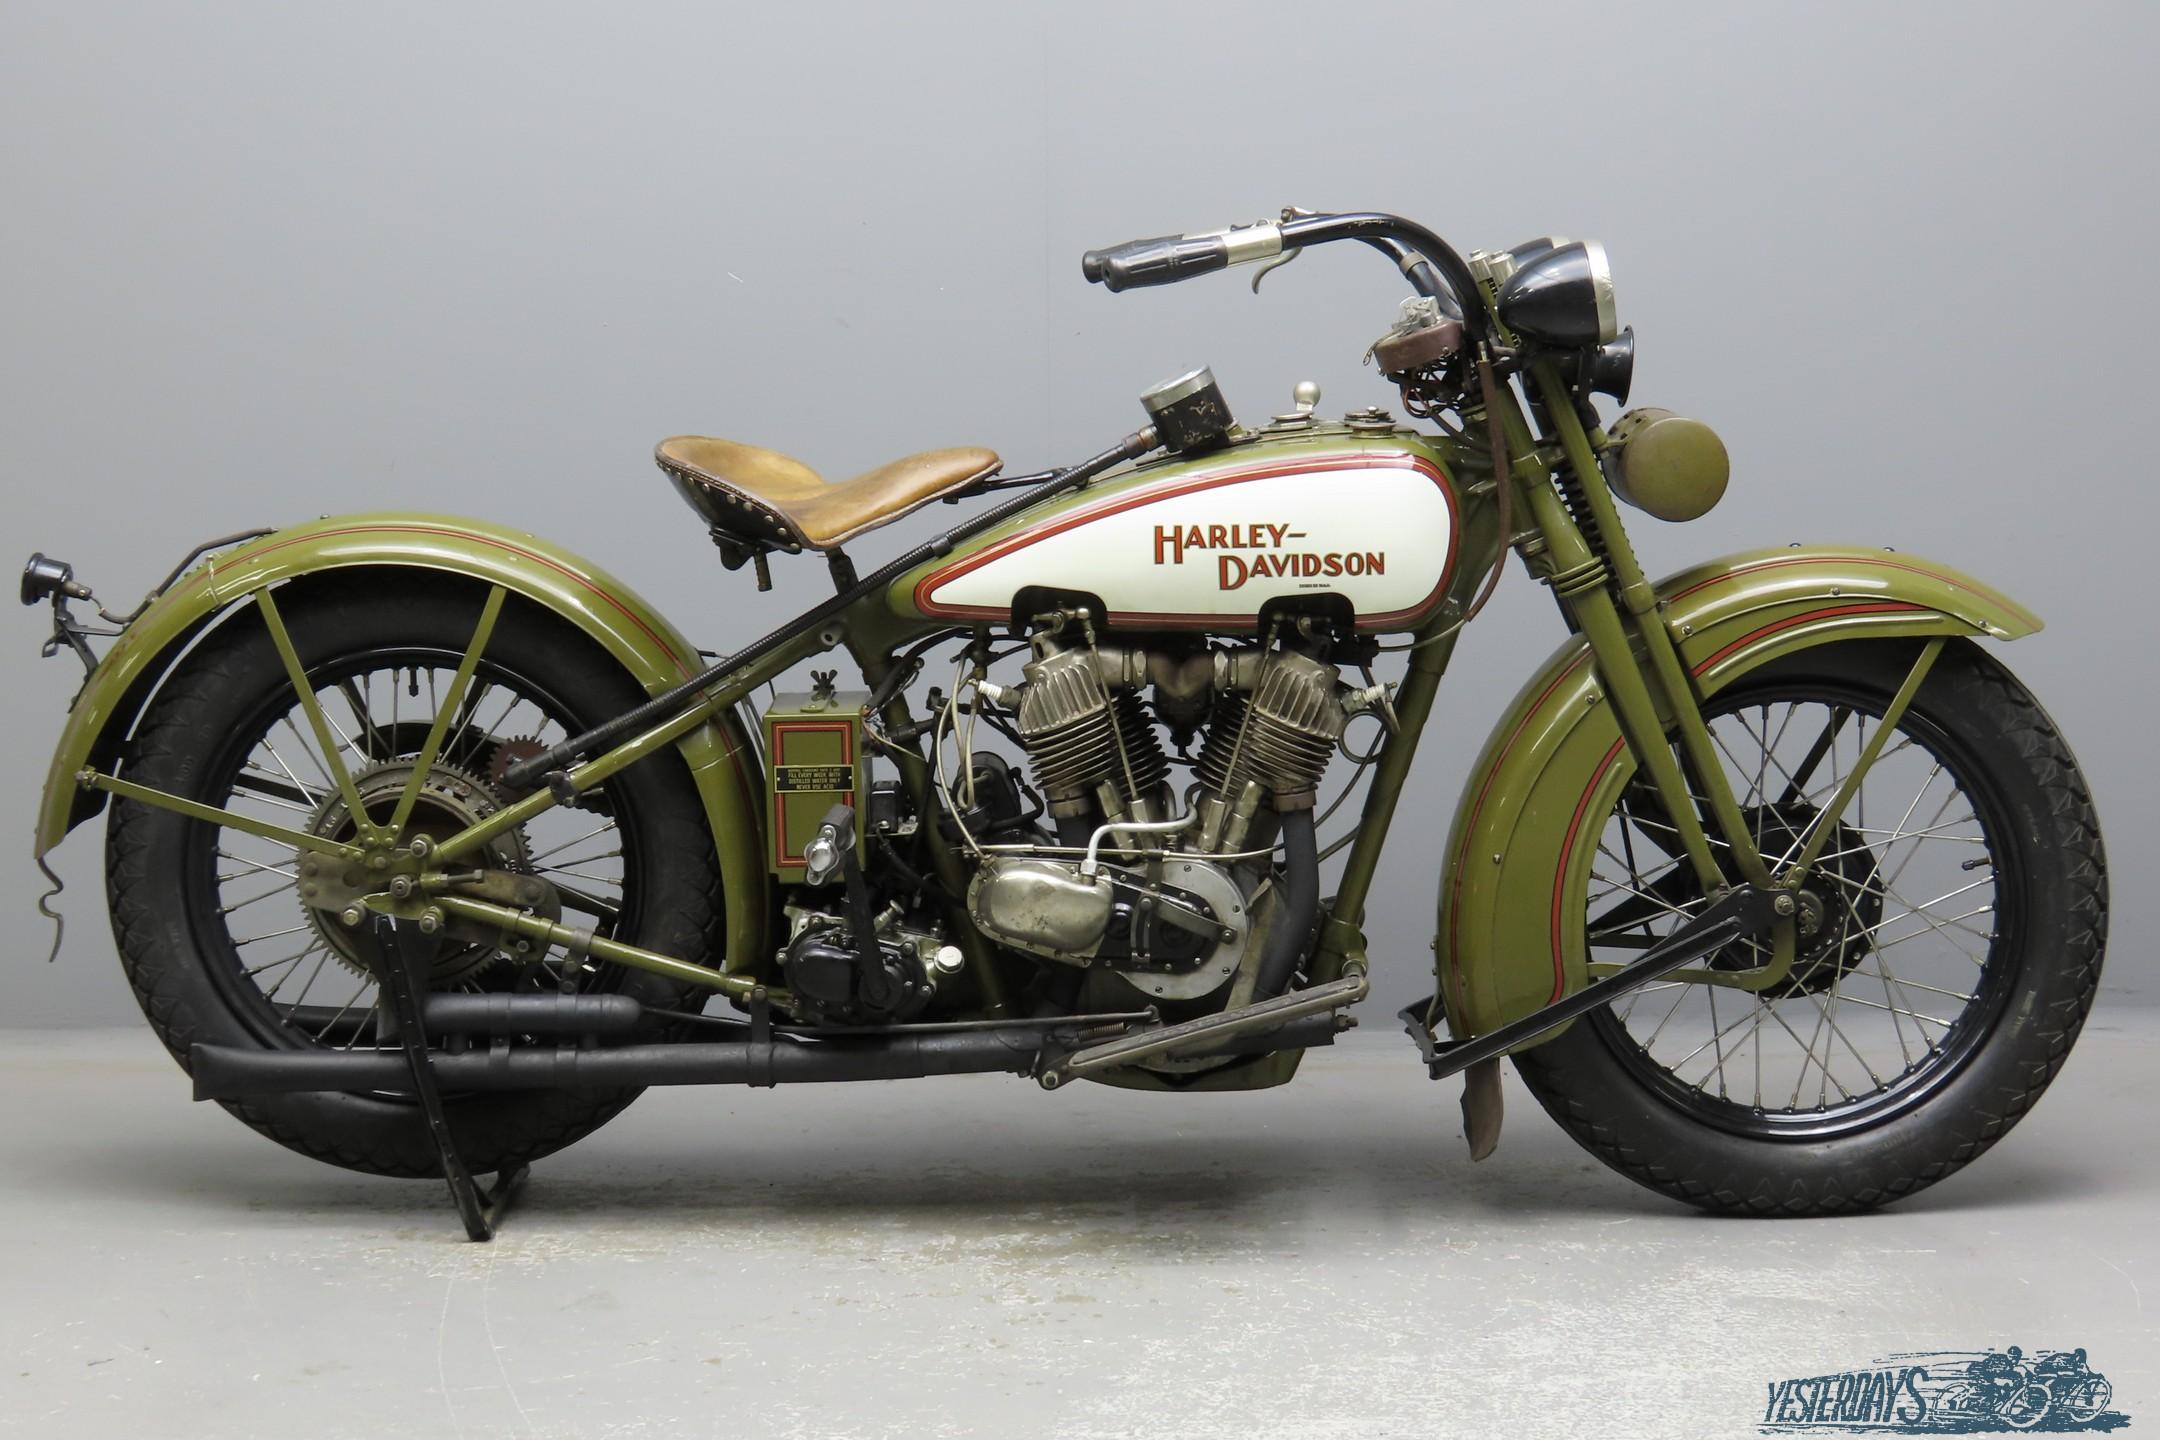 Harley Davidson 1929 JD 1212cc 2 cyl ioe  3007